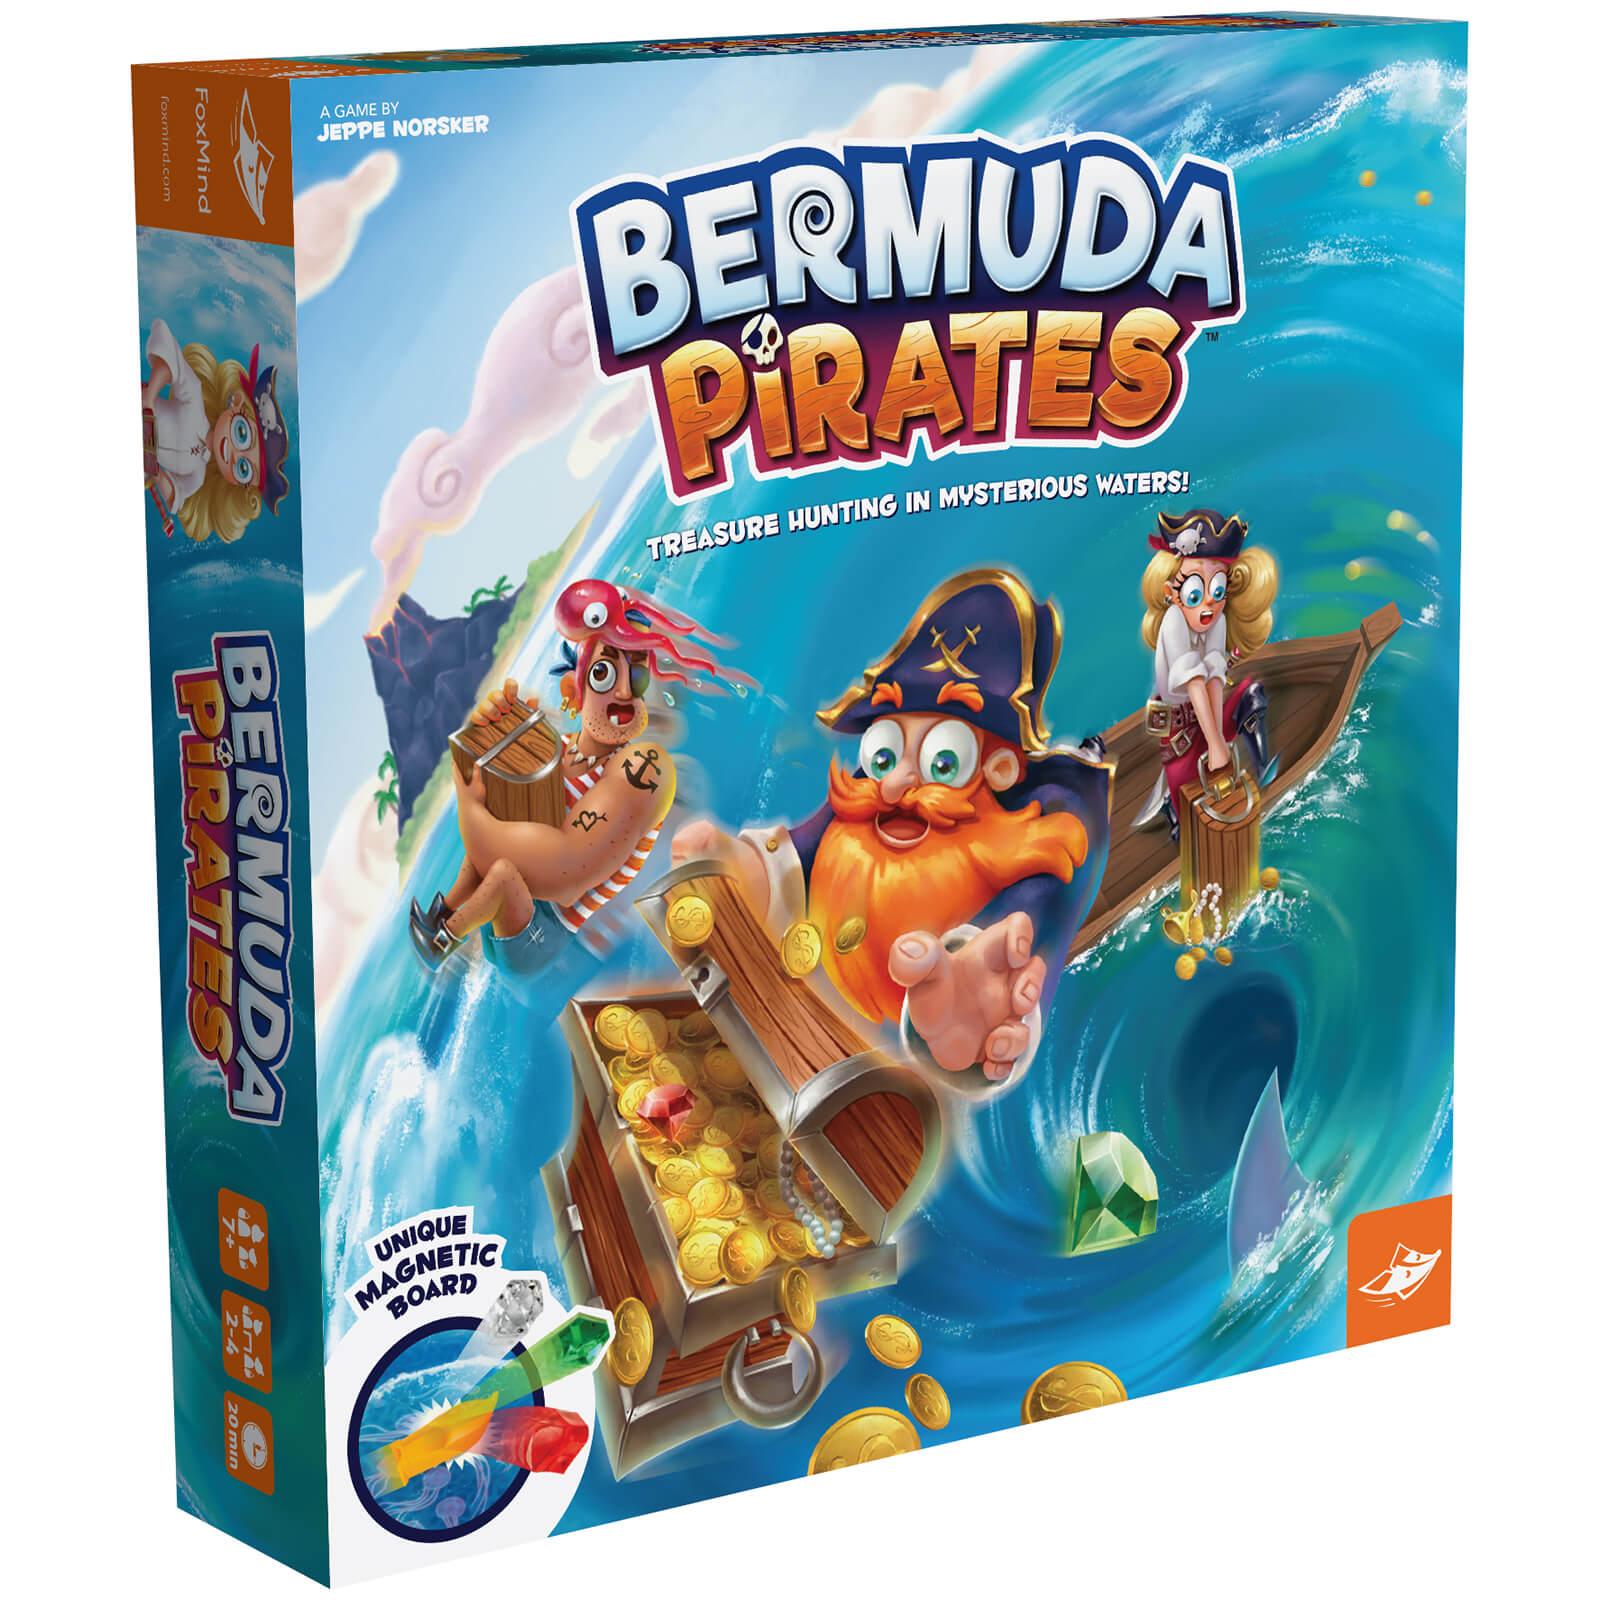 Image of Bermuda Pirates Board Game